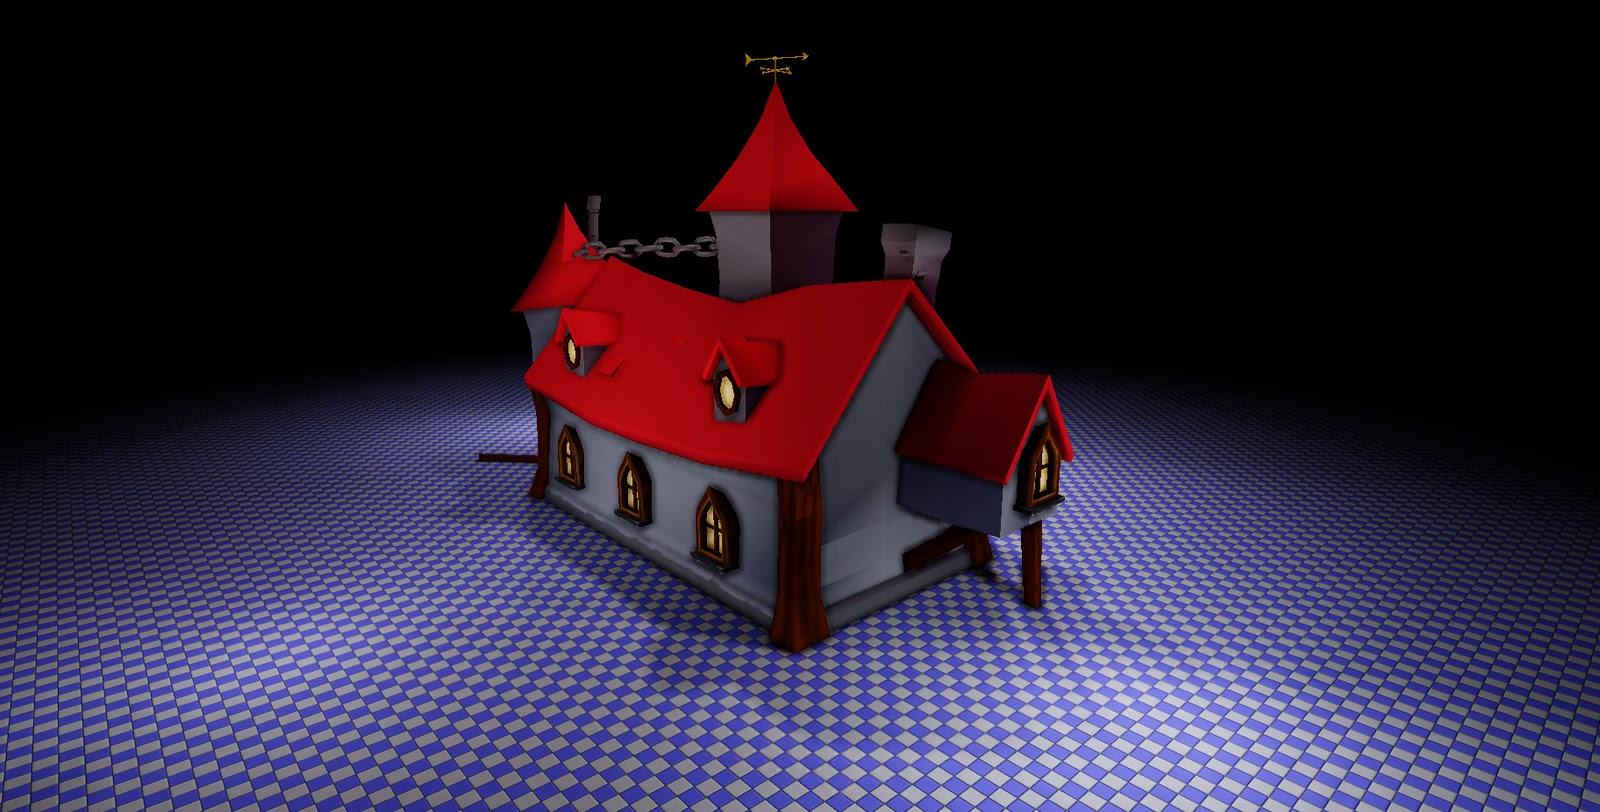 peter_Harries_UDK_house_texture3.jpg